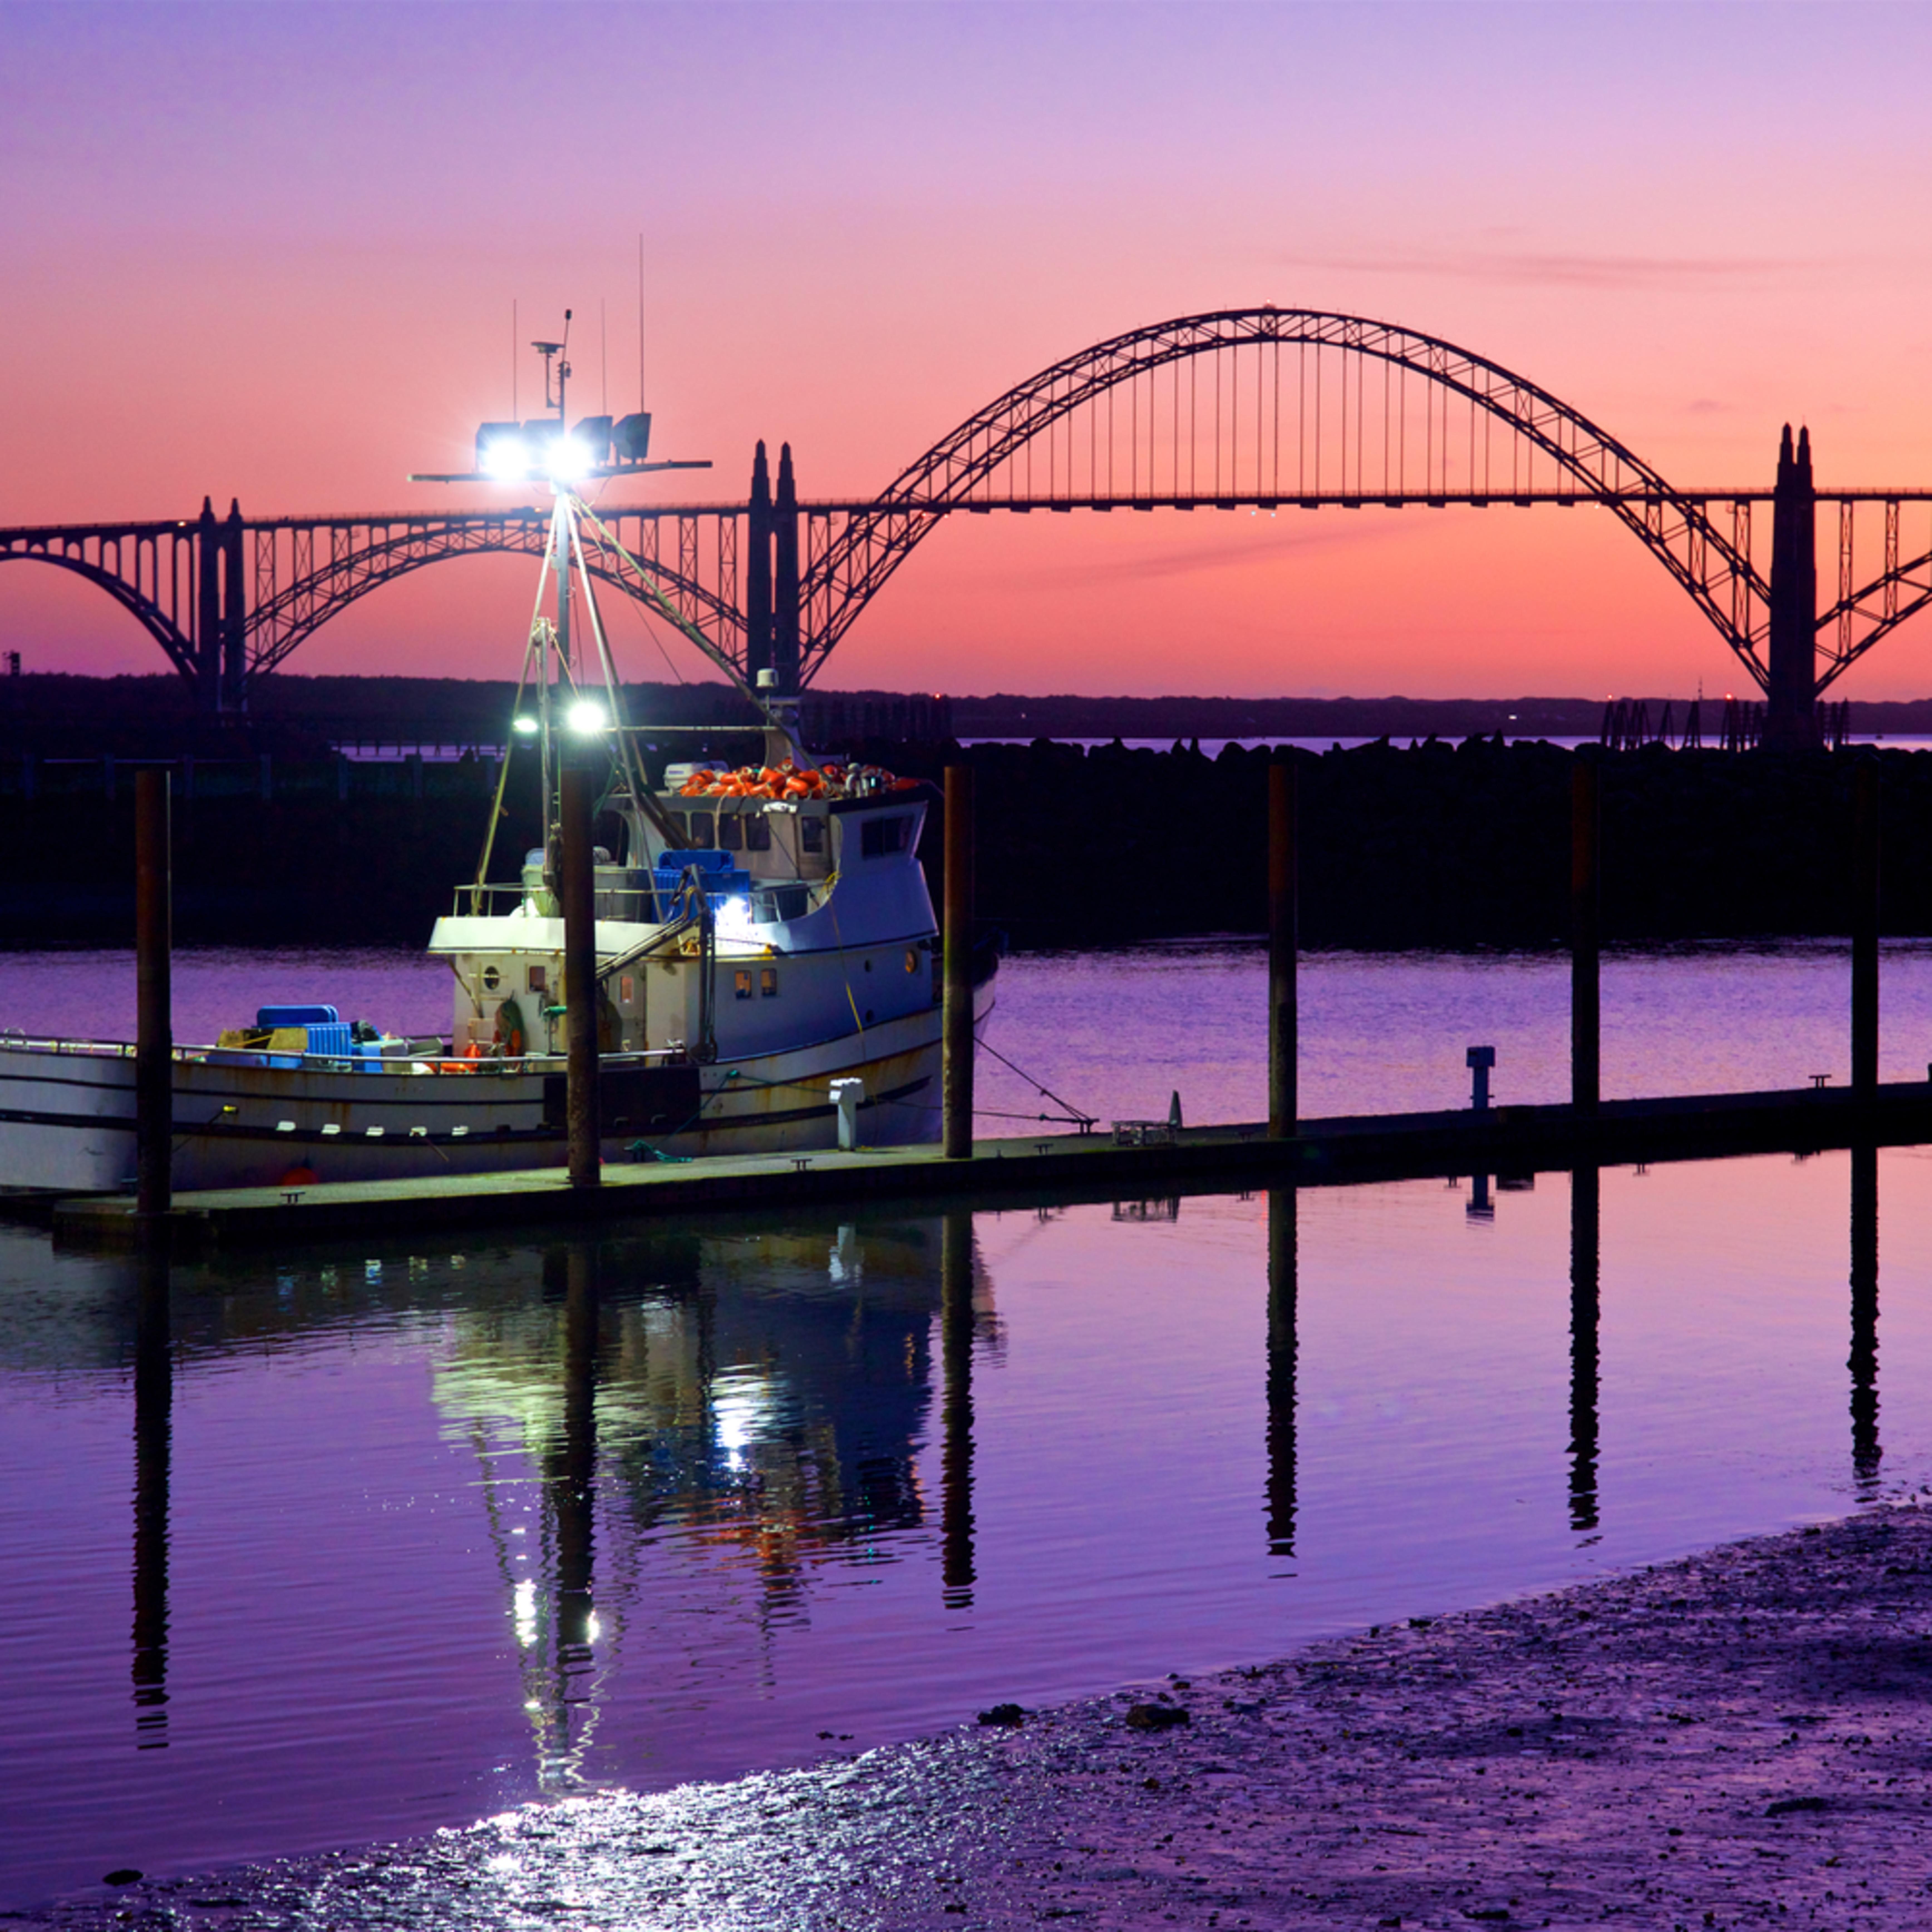 Fishing boat yaquina bay bridge sunset newport oregon qetpum